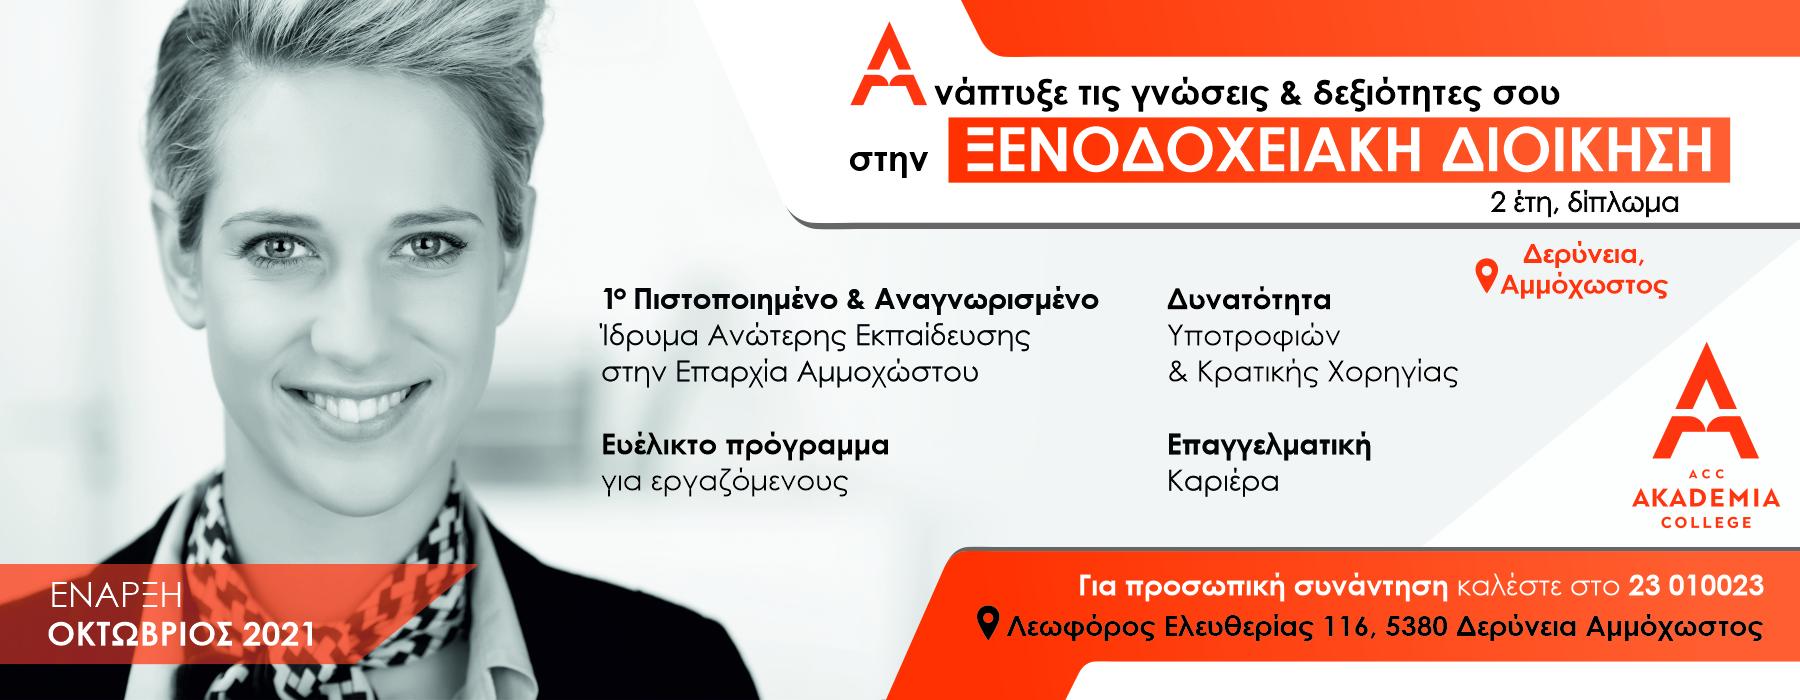 web-banner2021-greek